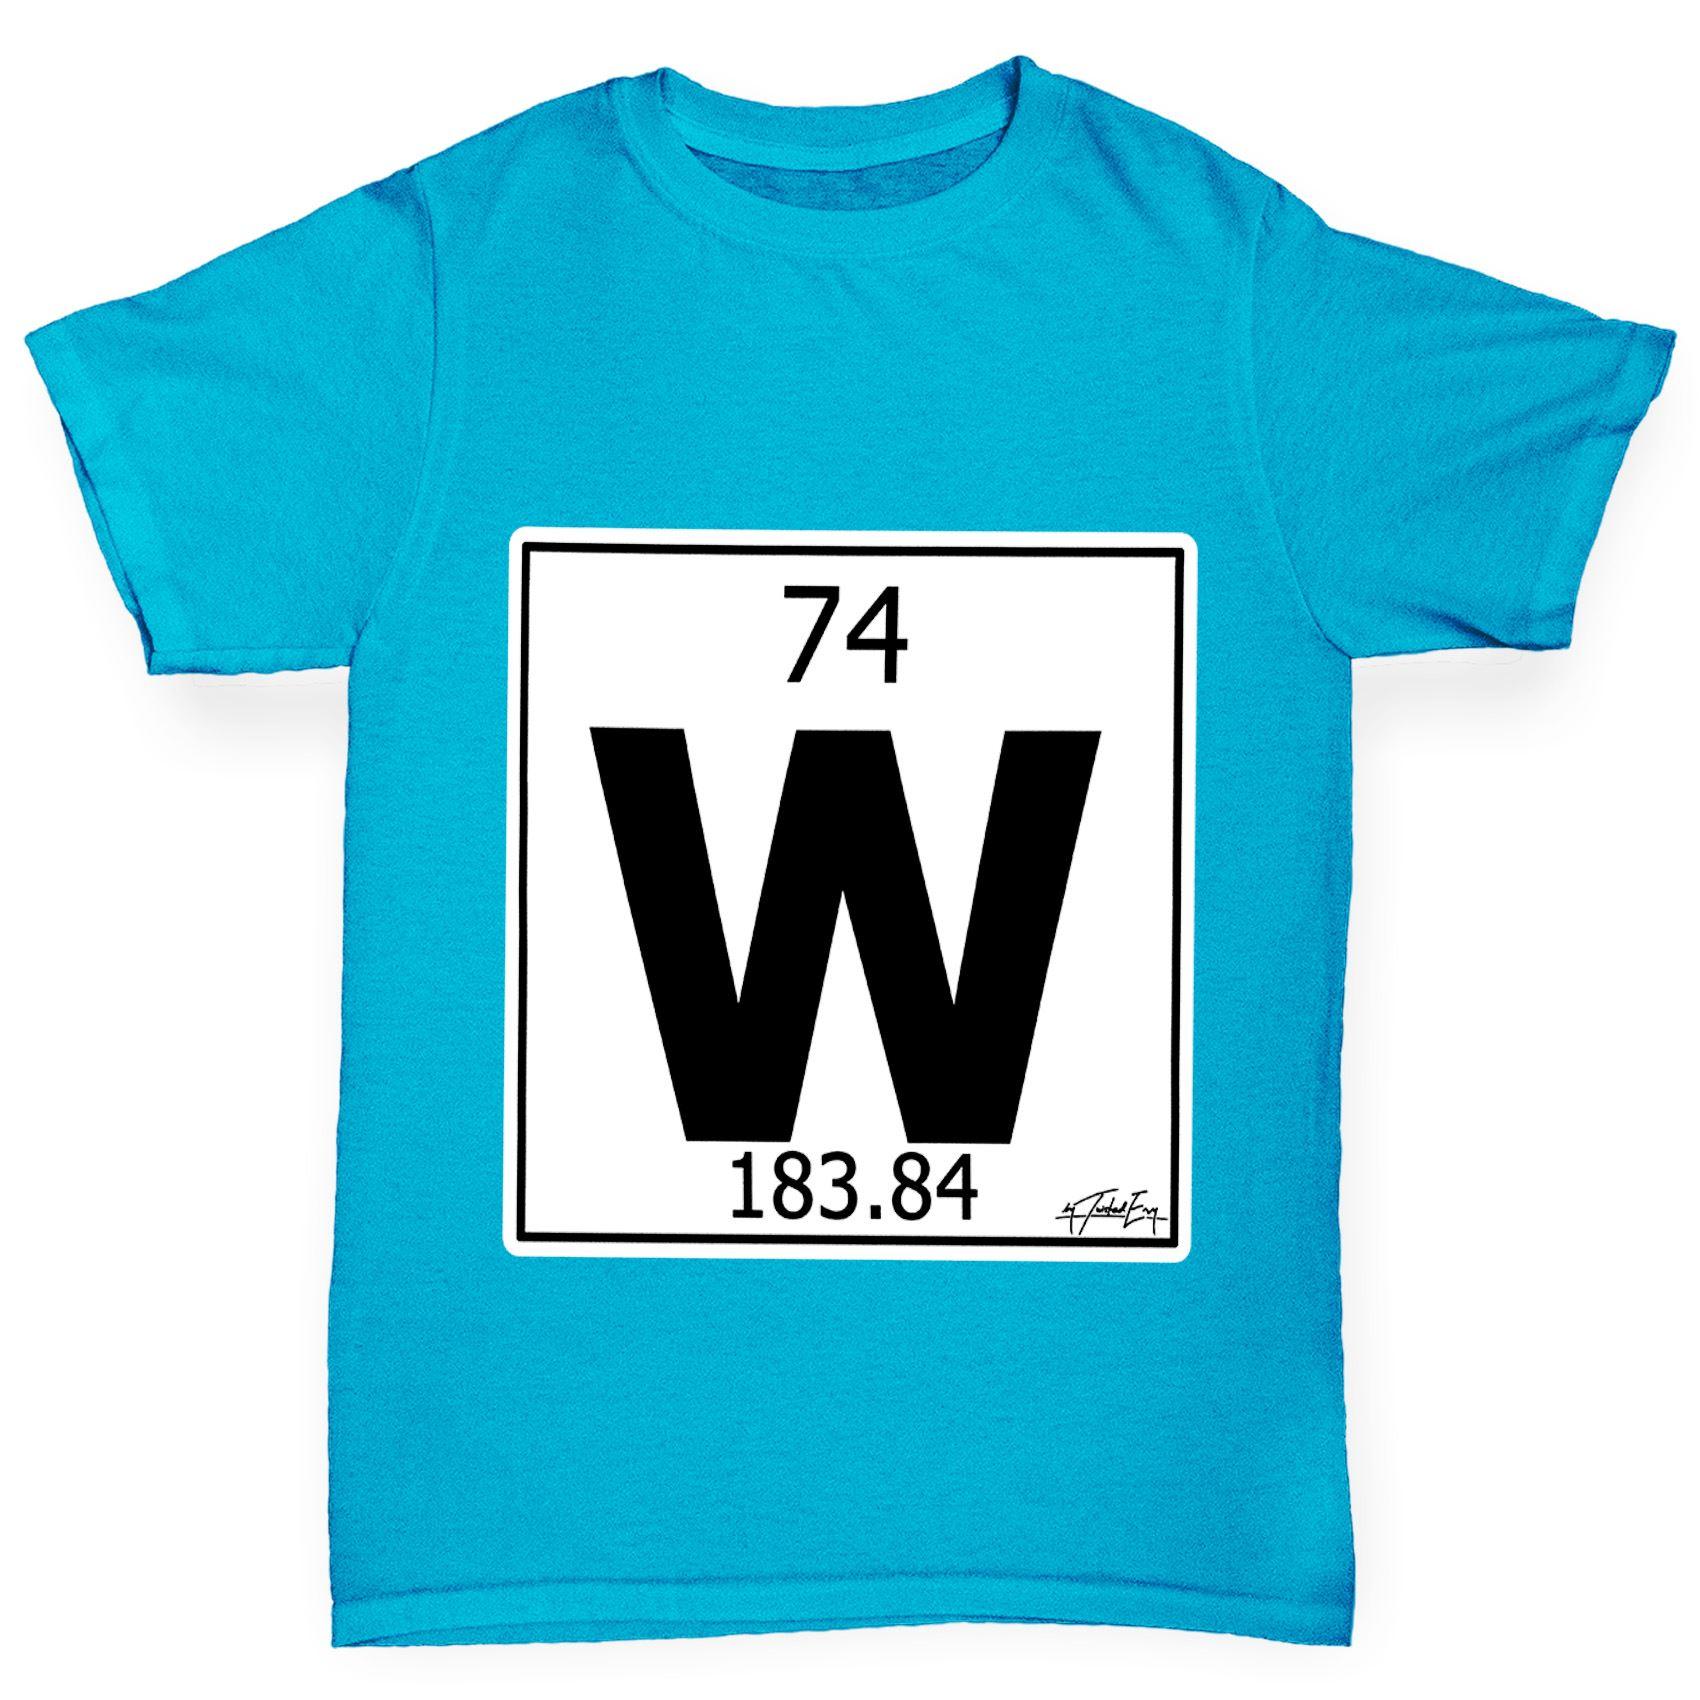 Twisted envy boys periodic table element w tungsten t shirt ebay twisted envy boy 039 s periodic table element urtaz Choice Image